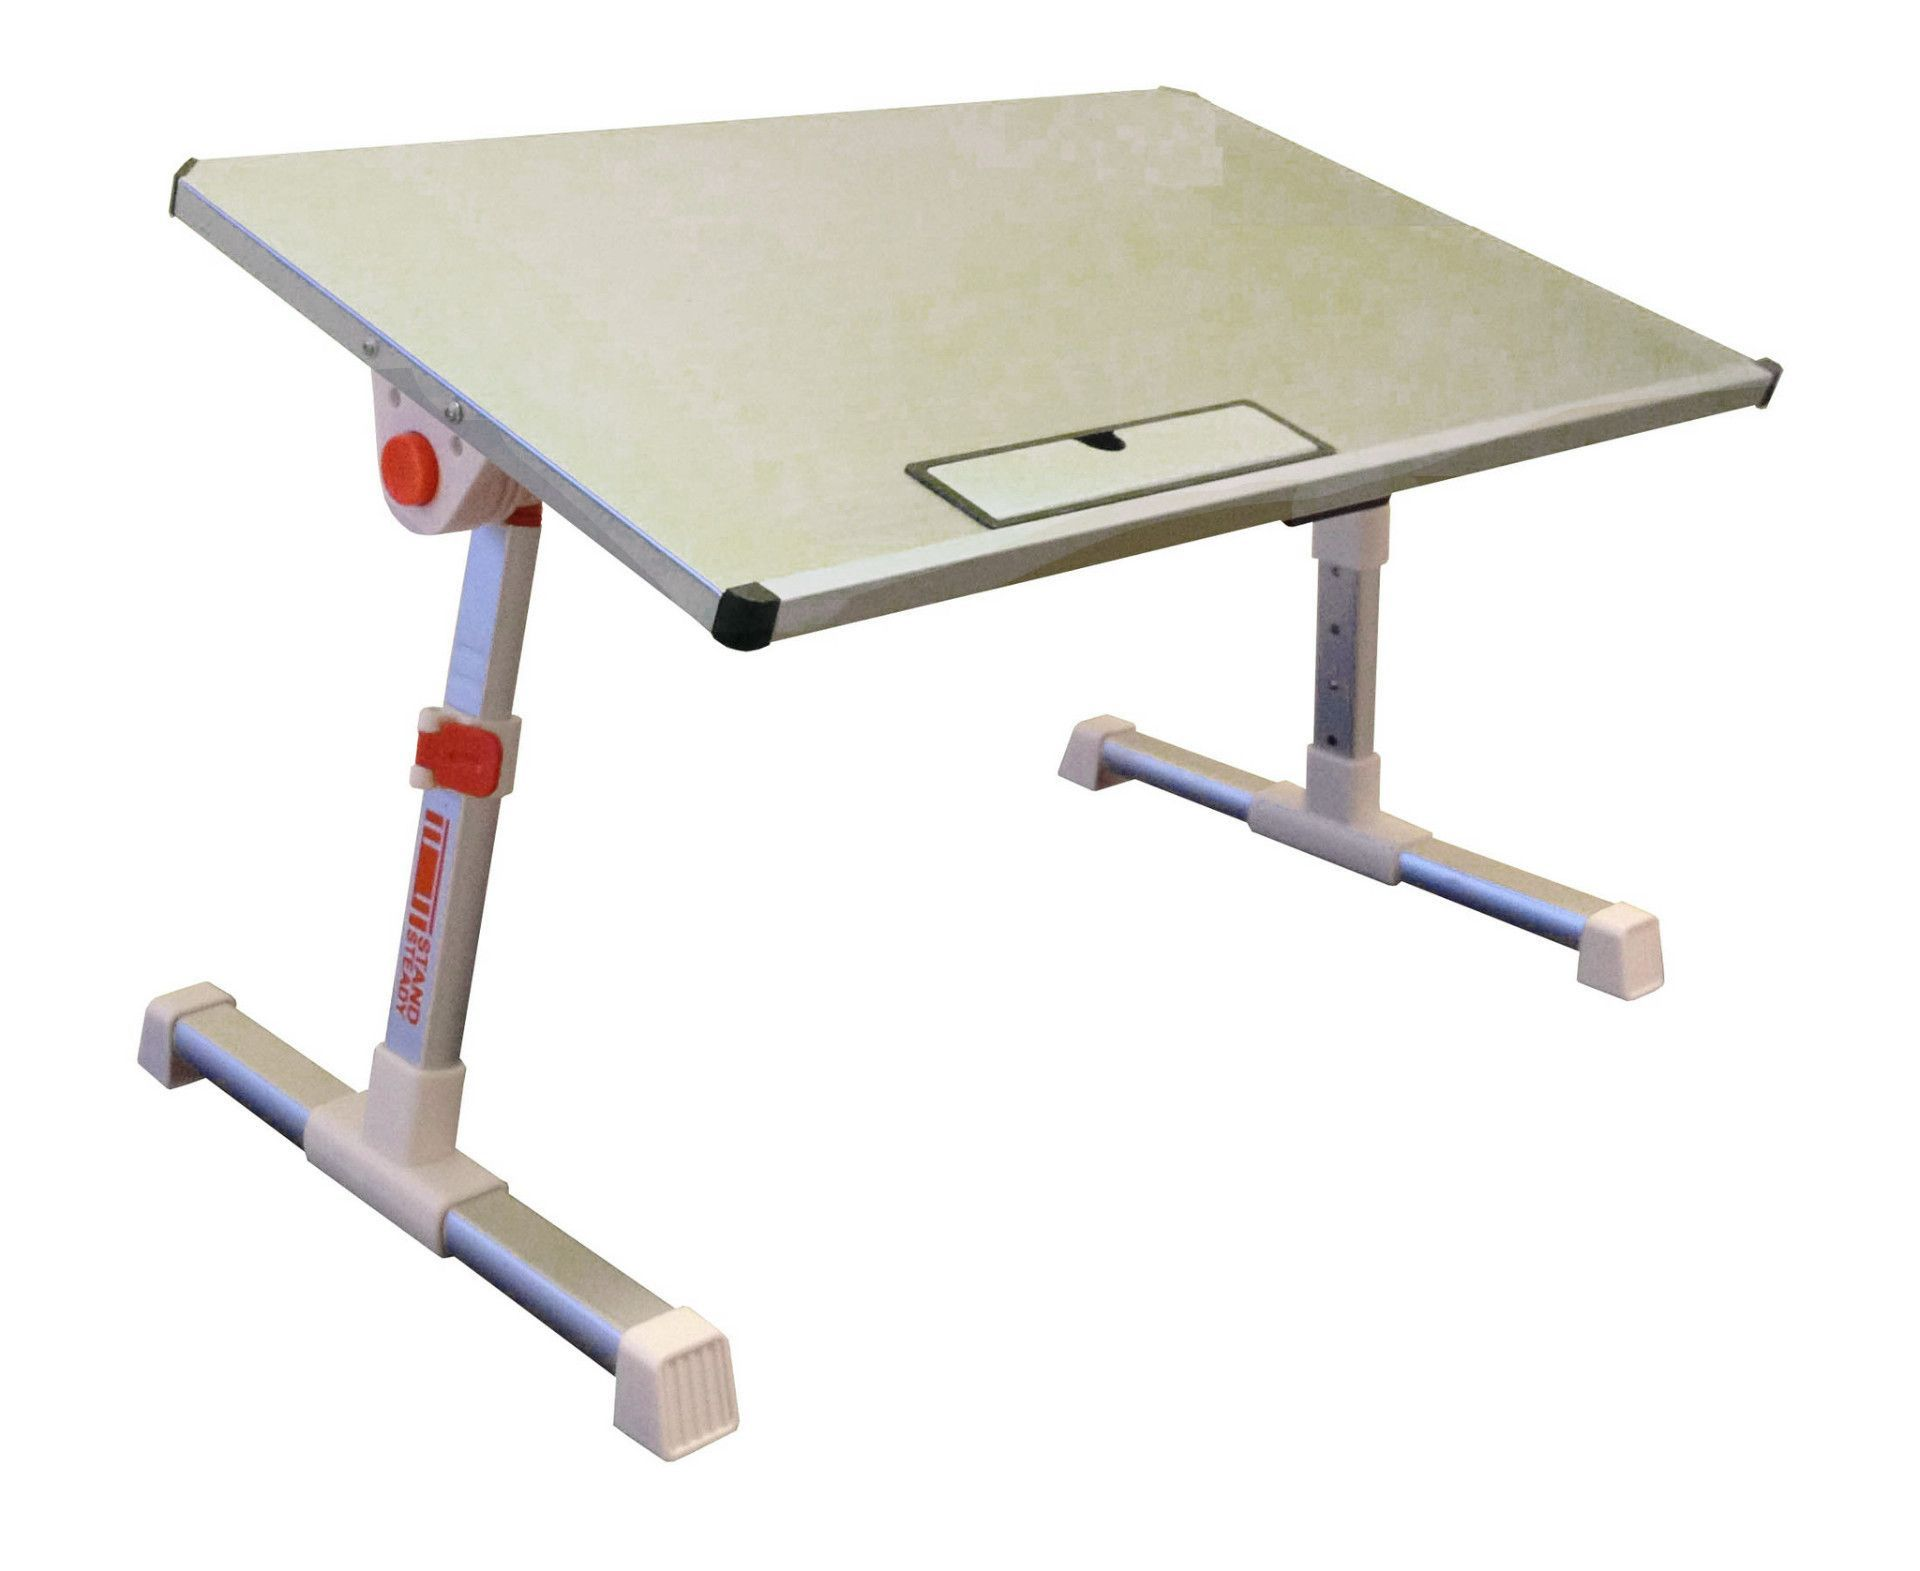 Etonnant Traveler Folding Stand Up Desk / Adjustable Lap Desk (SMALL/TRAVEL SIZE)